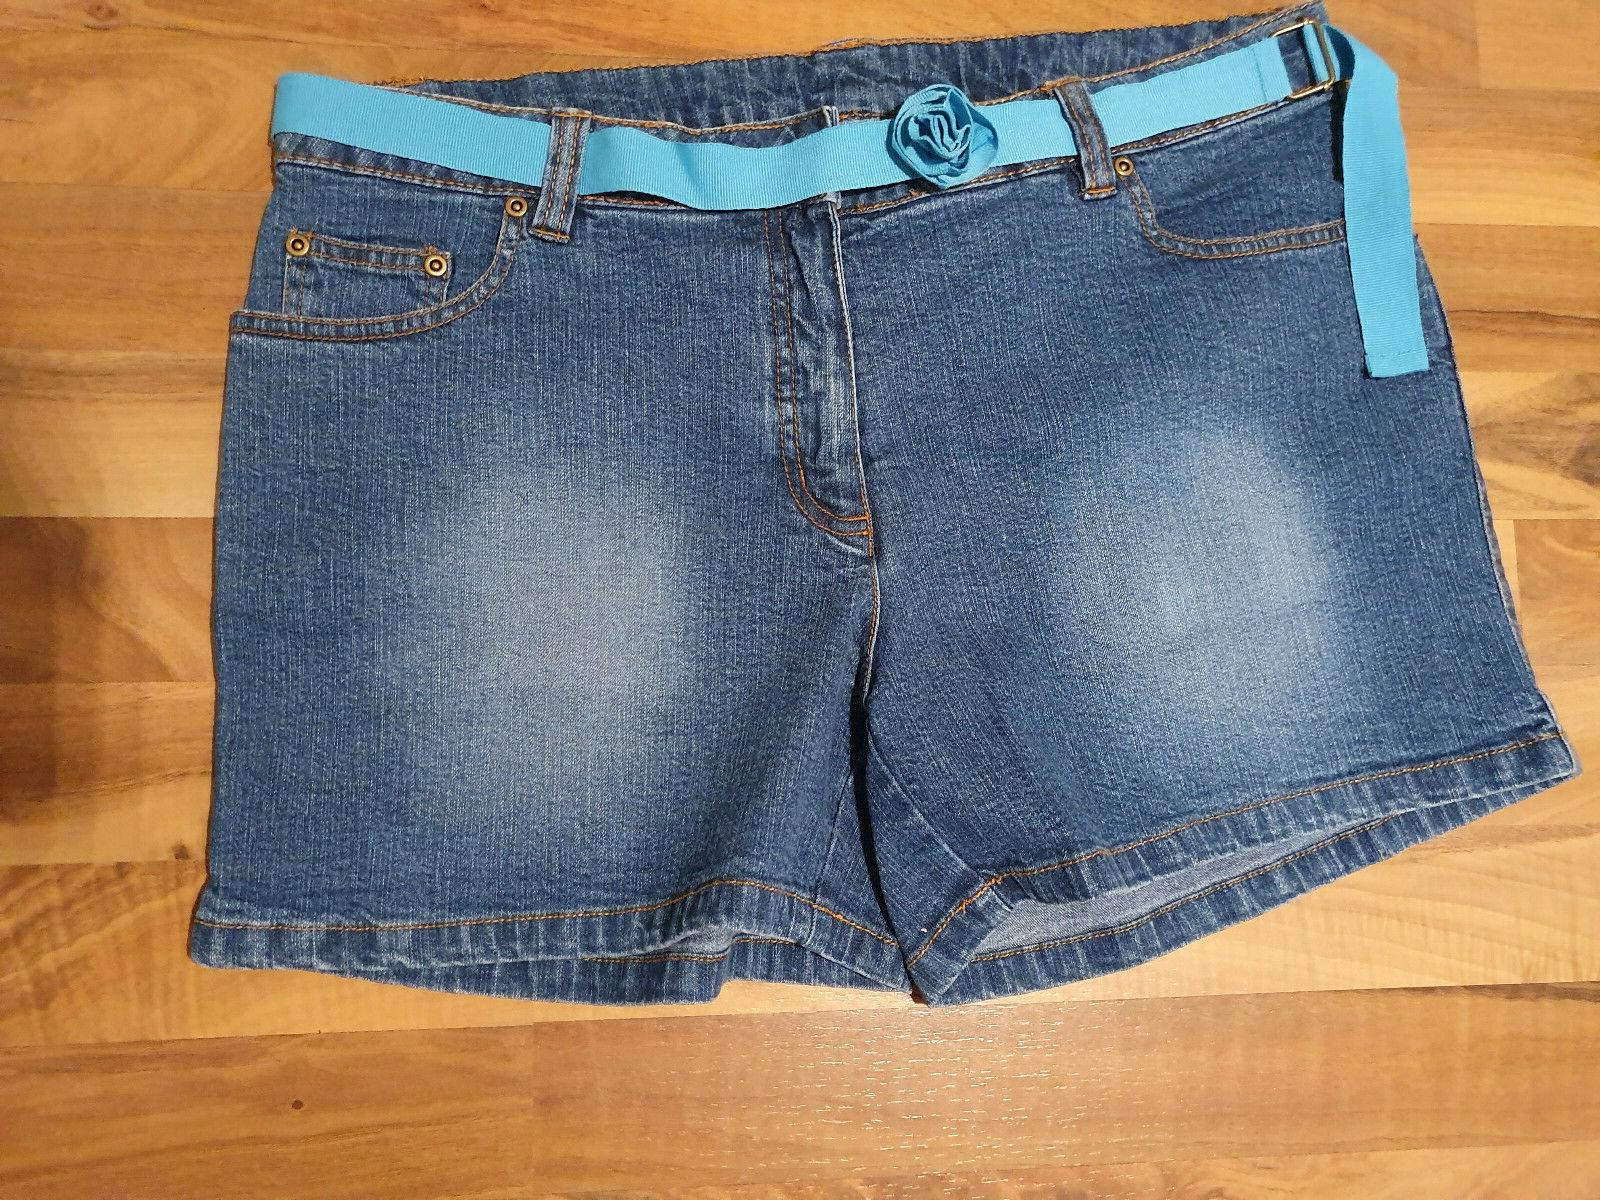 cc345c986232 Kurze Jeans Damen Grösse 44 Test Vergleich +++ Kurze Jeans Damen ...